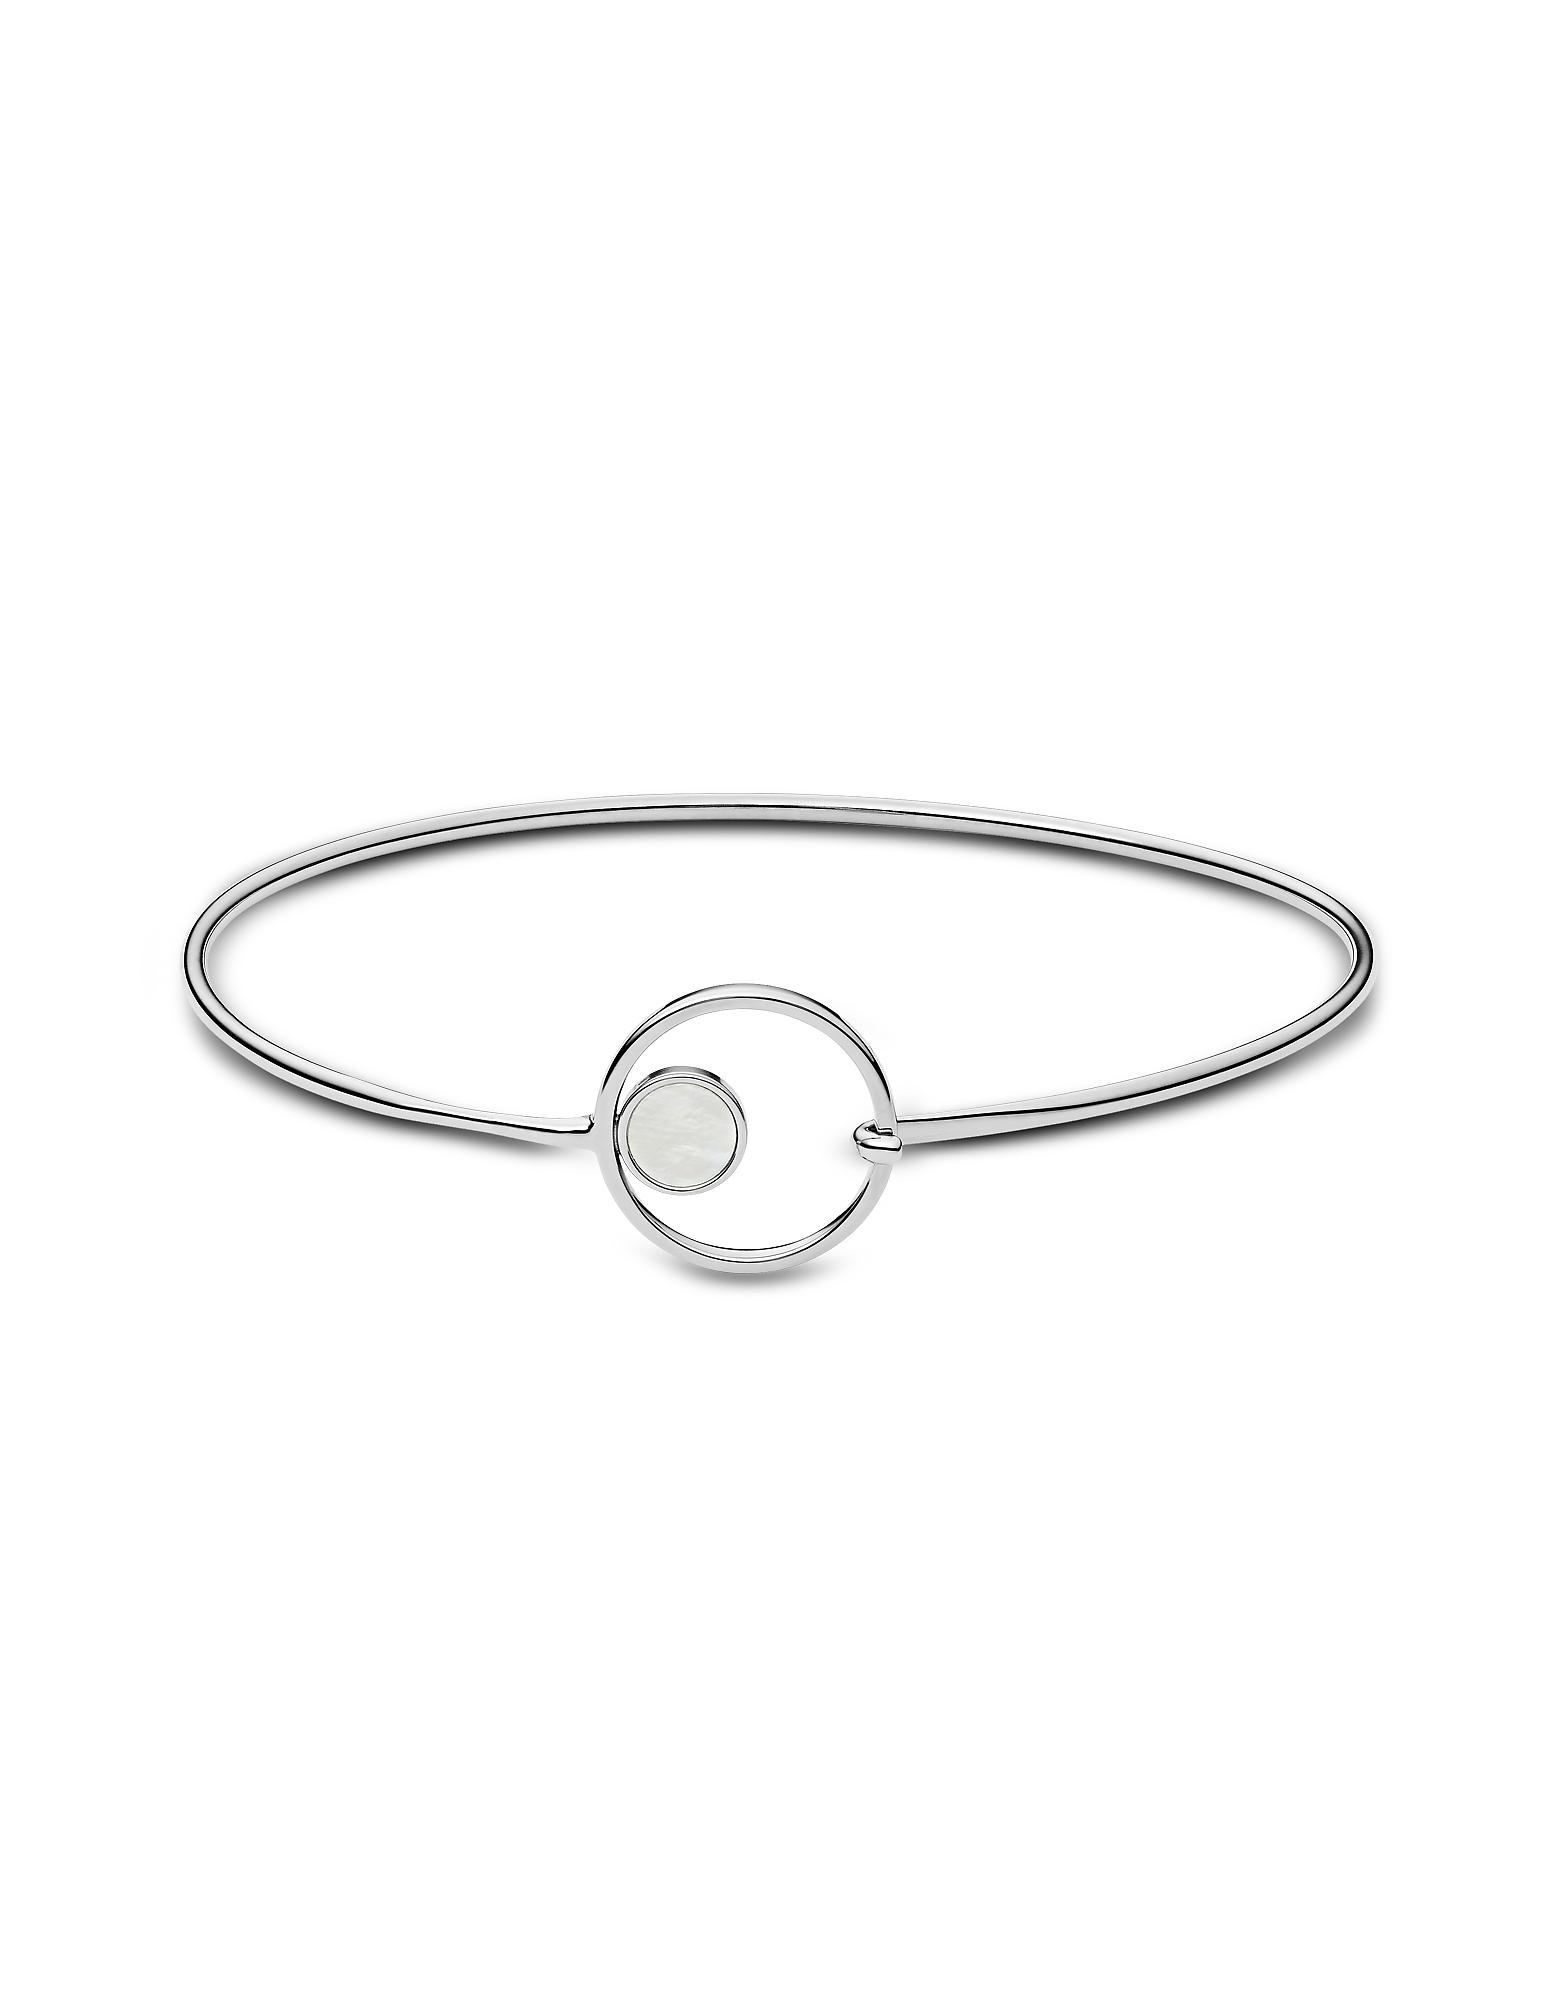 Skagen Bracelets, Agnethe Silver Tone Mother of Pearl Bangle Bracelet